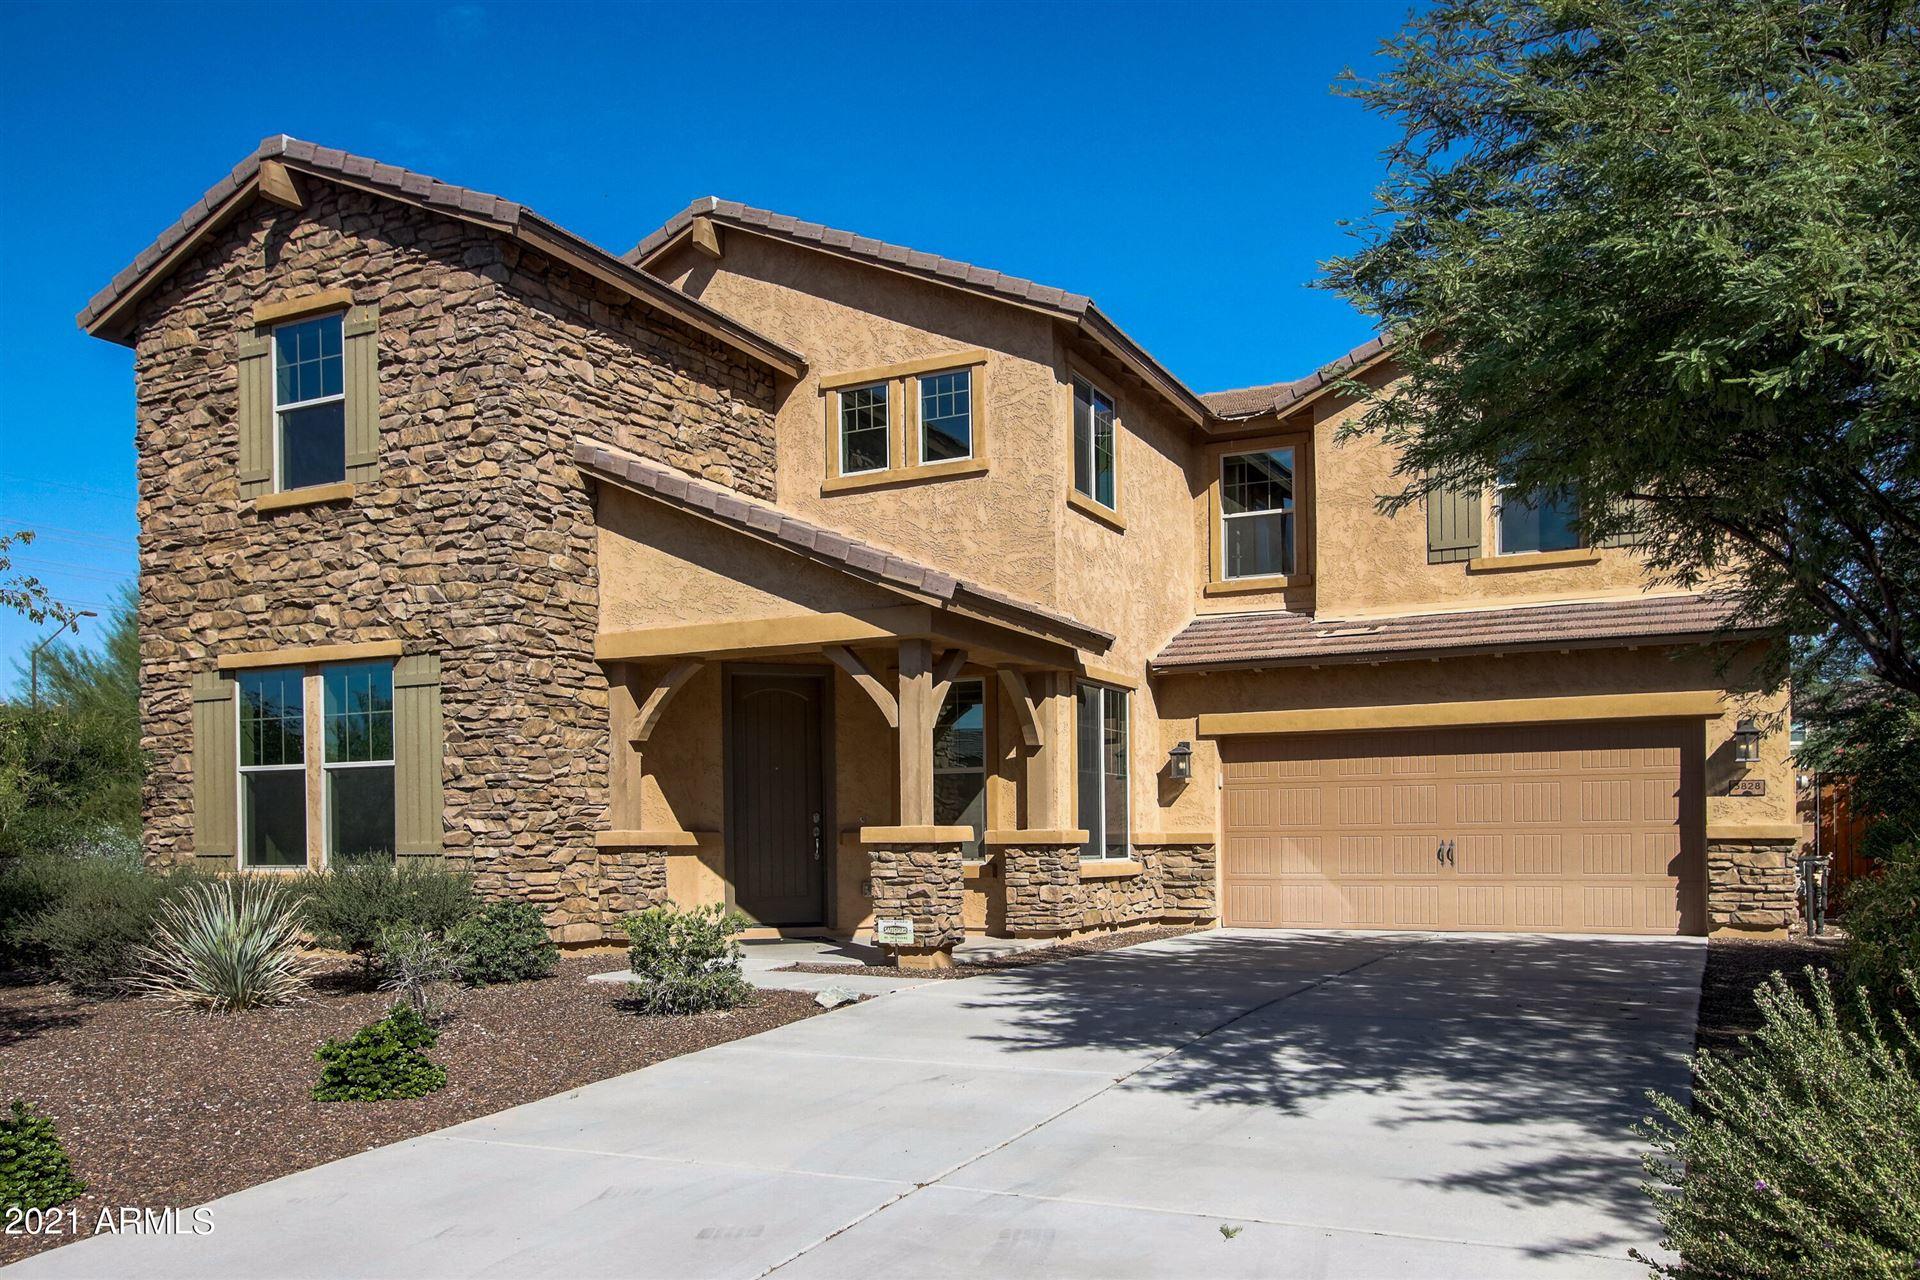 Photo of 3828 W LAPENNA Drive, New River, AZ 85087 (MLS # 6304134)